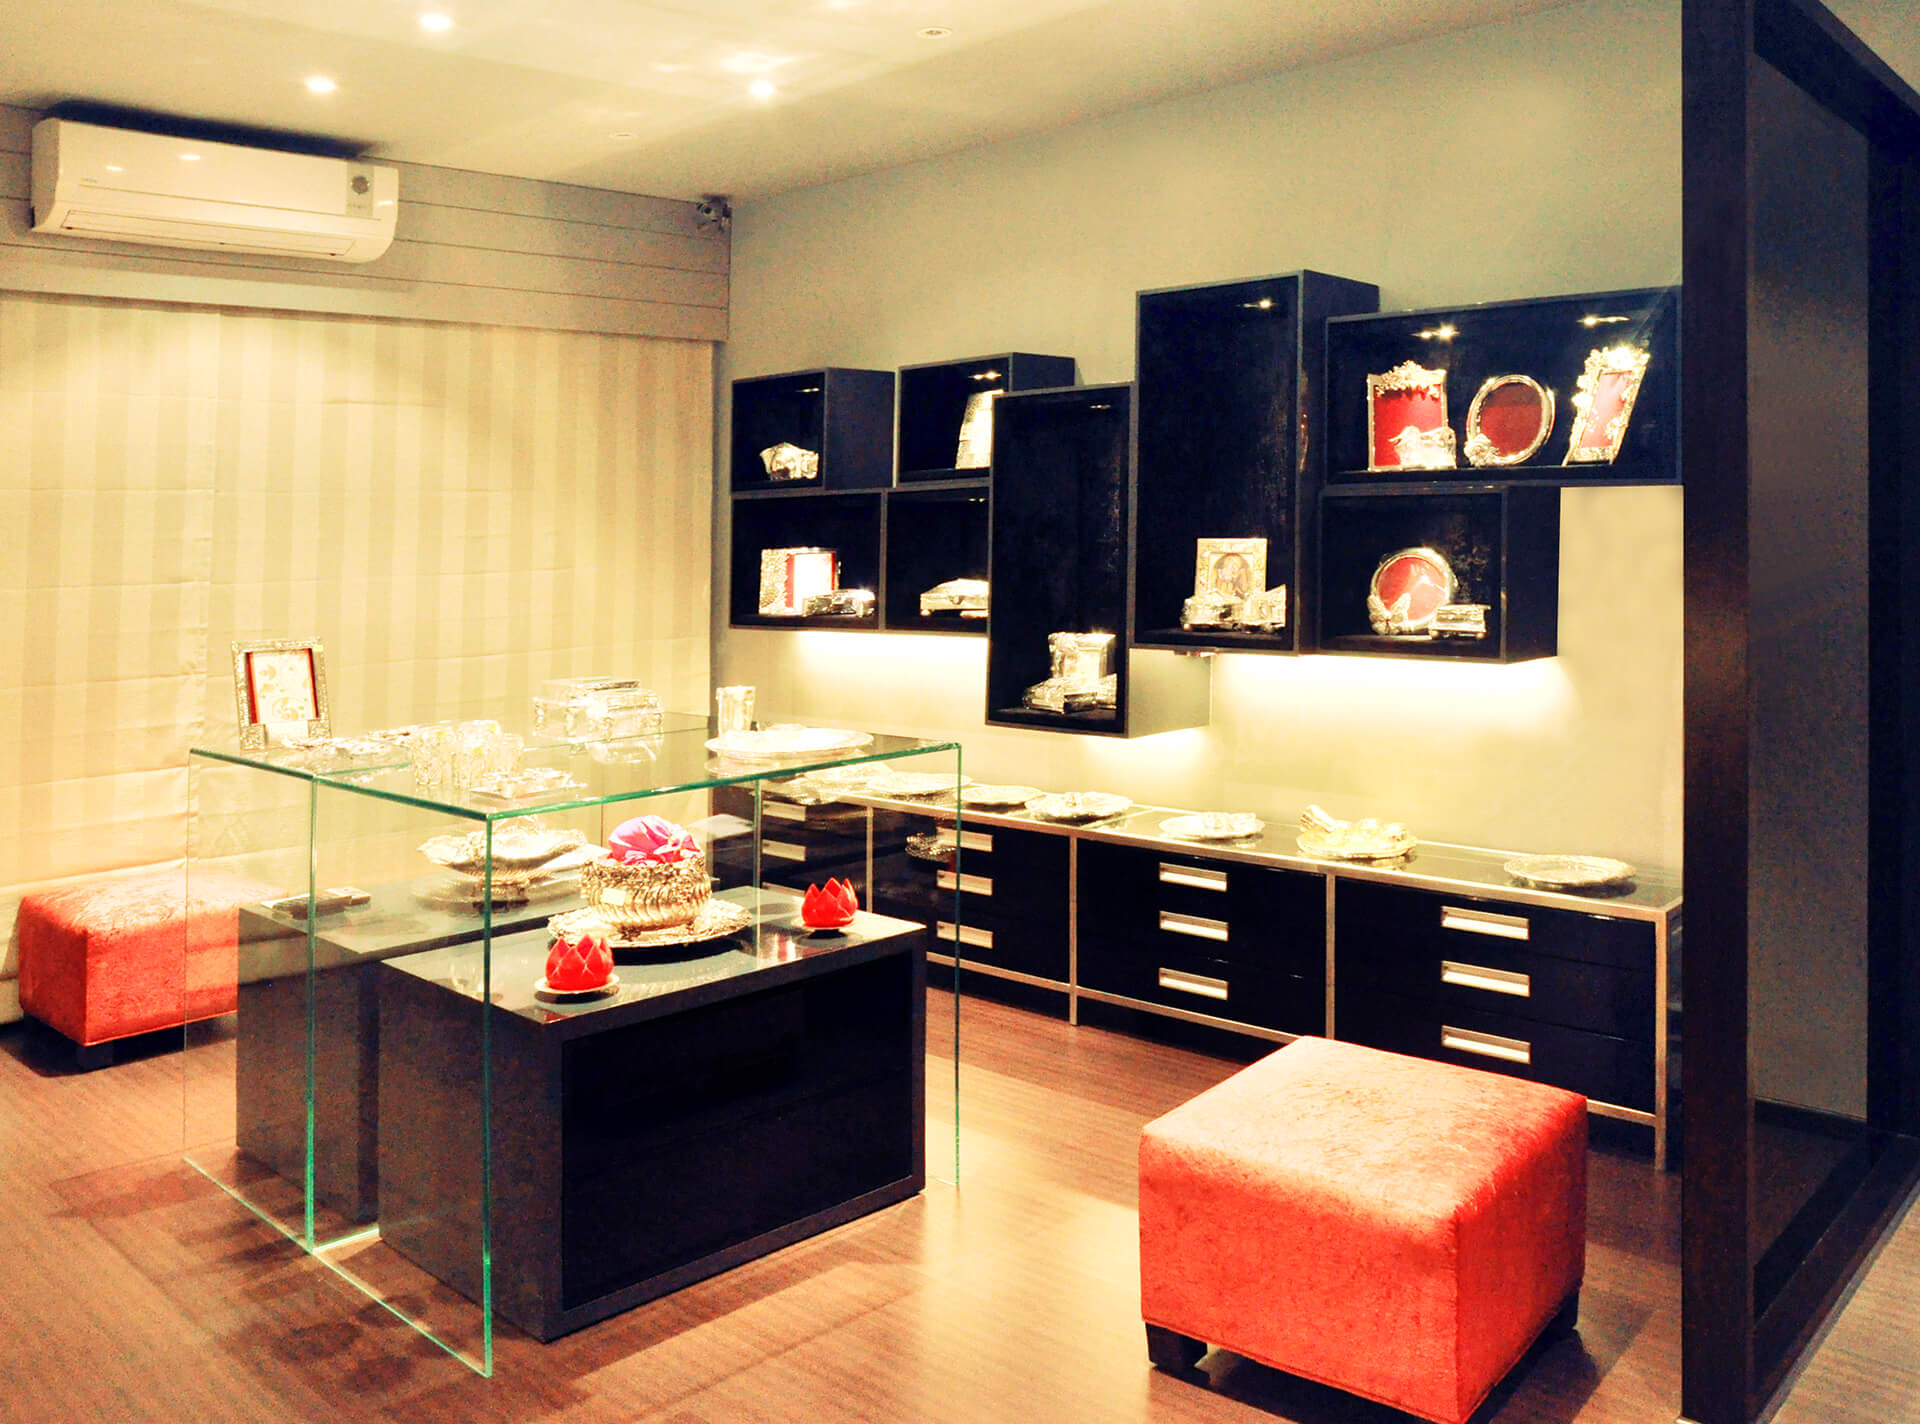 Store at Prabhadevi